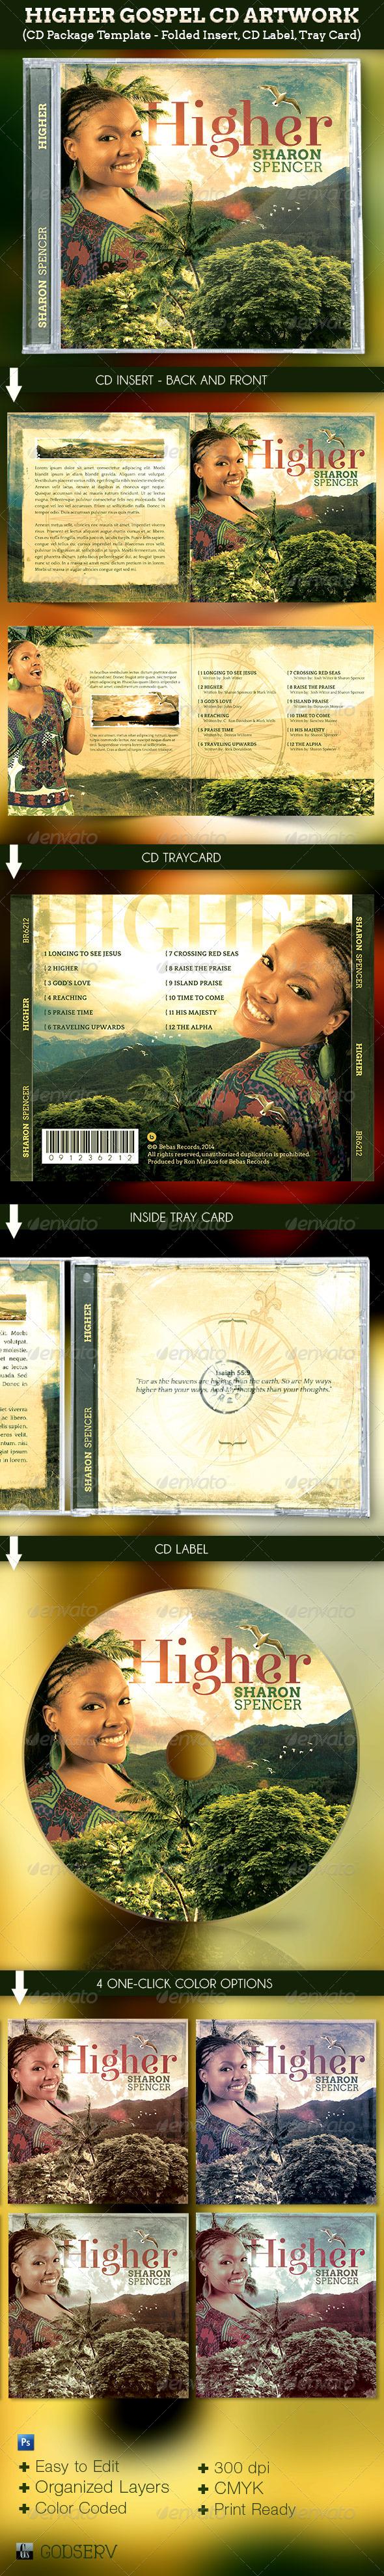 Higher Gospel CD Artwork Template - CD & DVD Artwork Print Templates